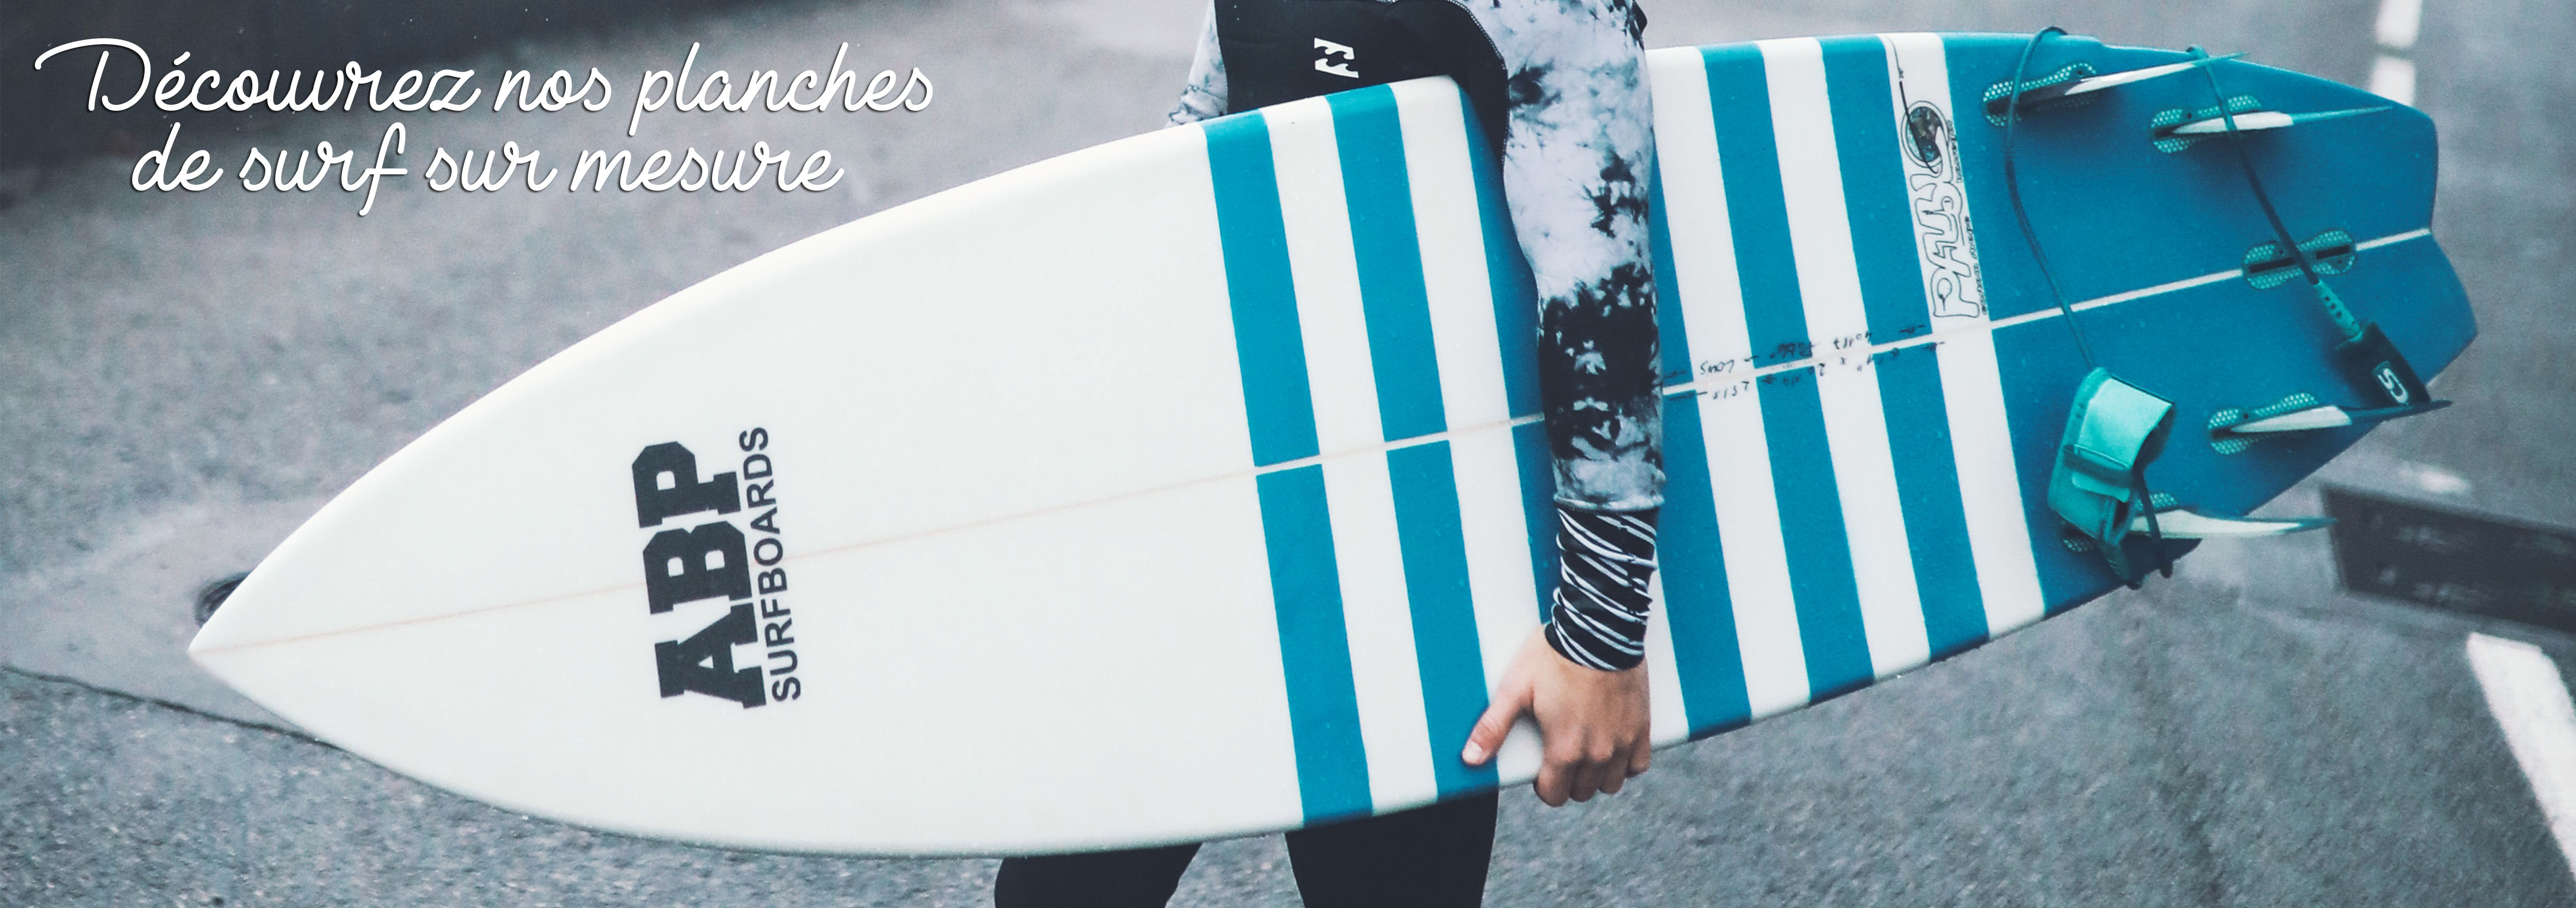 ABP surf sur mesure shape surfboards handmade